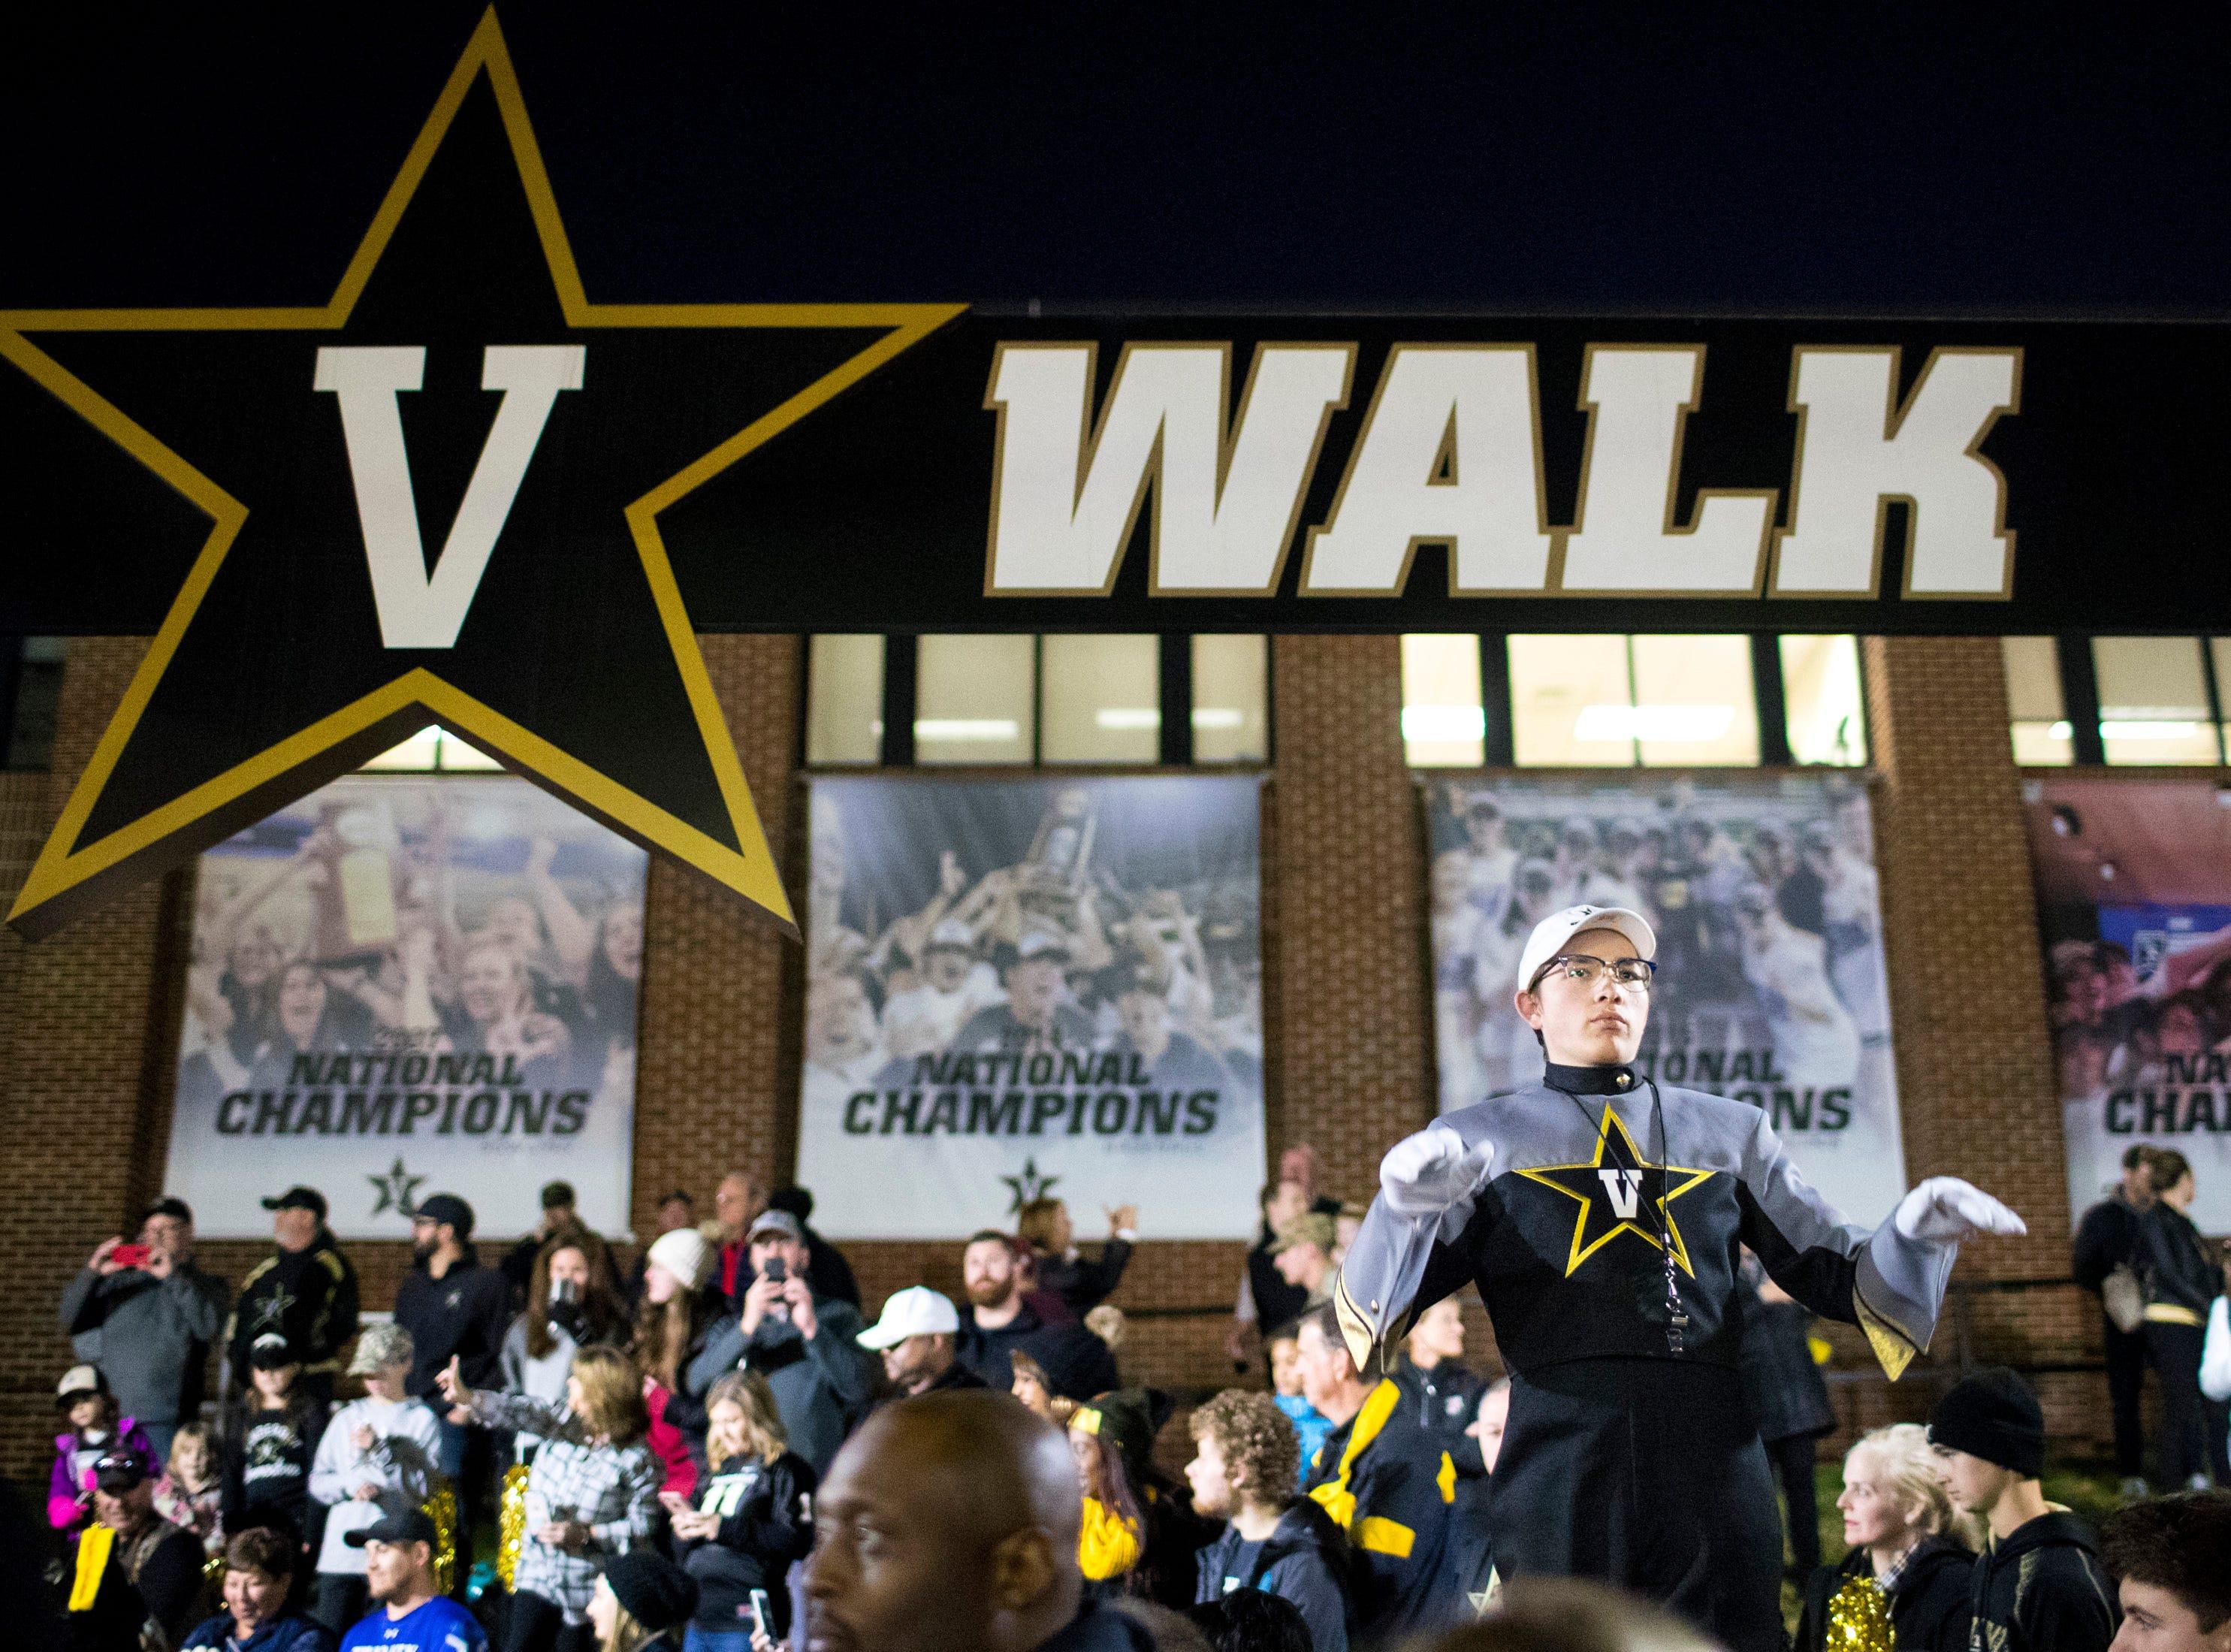 A member of Vanderbilt's marching band directs the band members during the star walk before Vanderbilt's game against Ole Miss outside of Vanderbilt Stadium in Nashville on Saturday, Nov. 17, 2018.